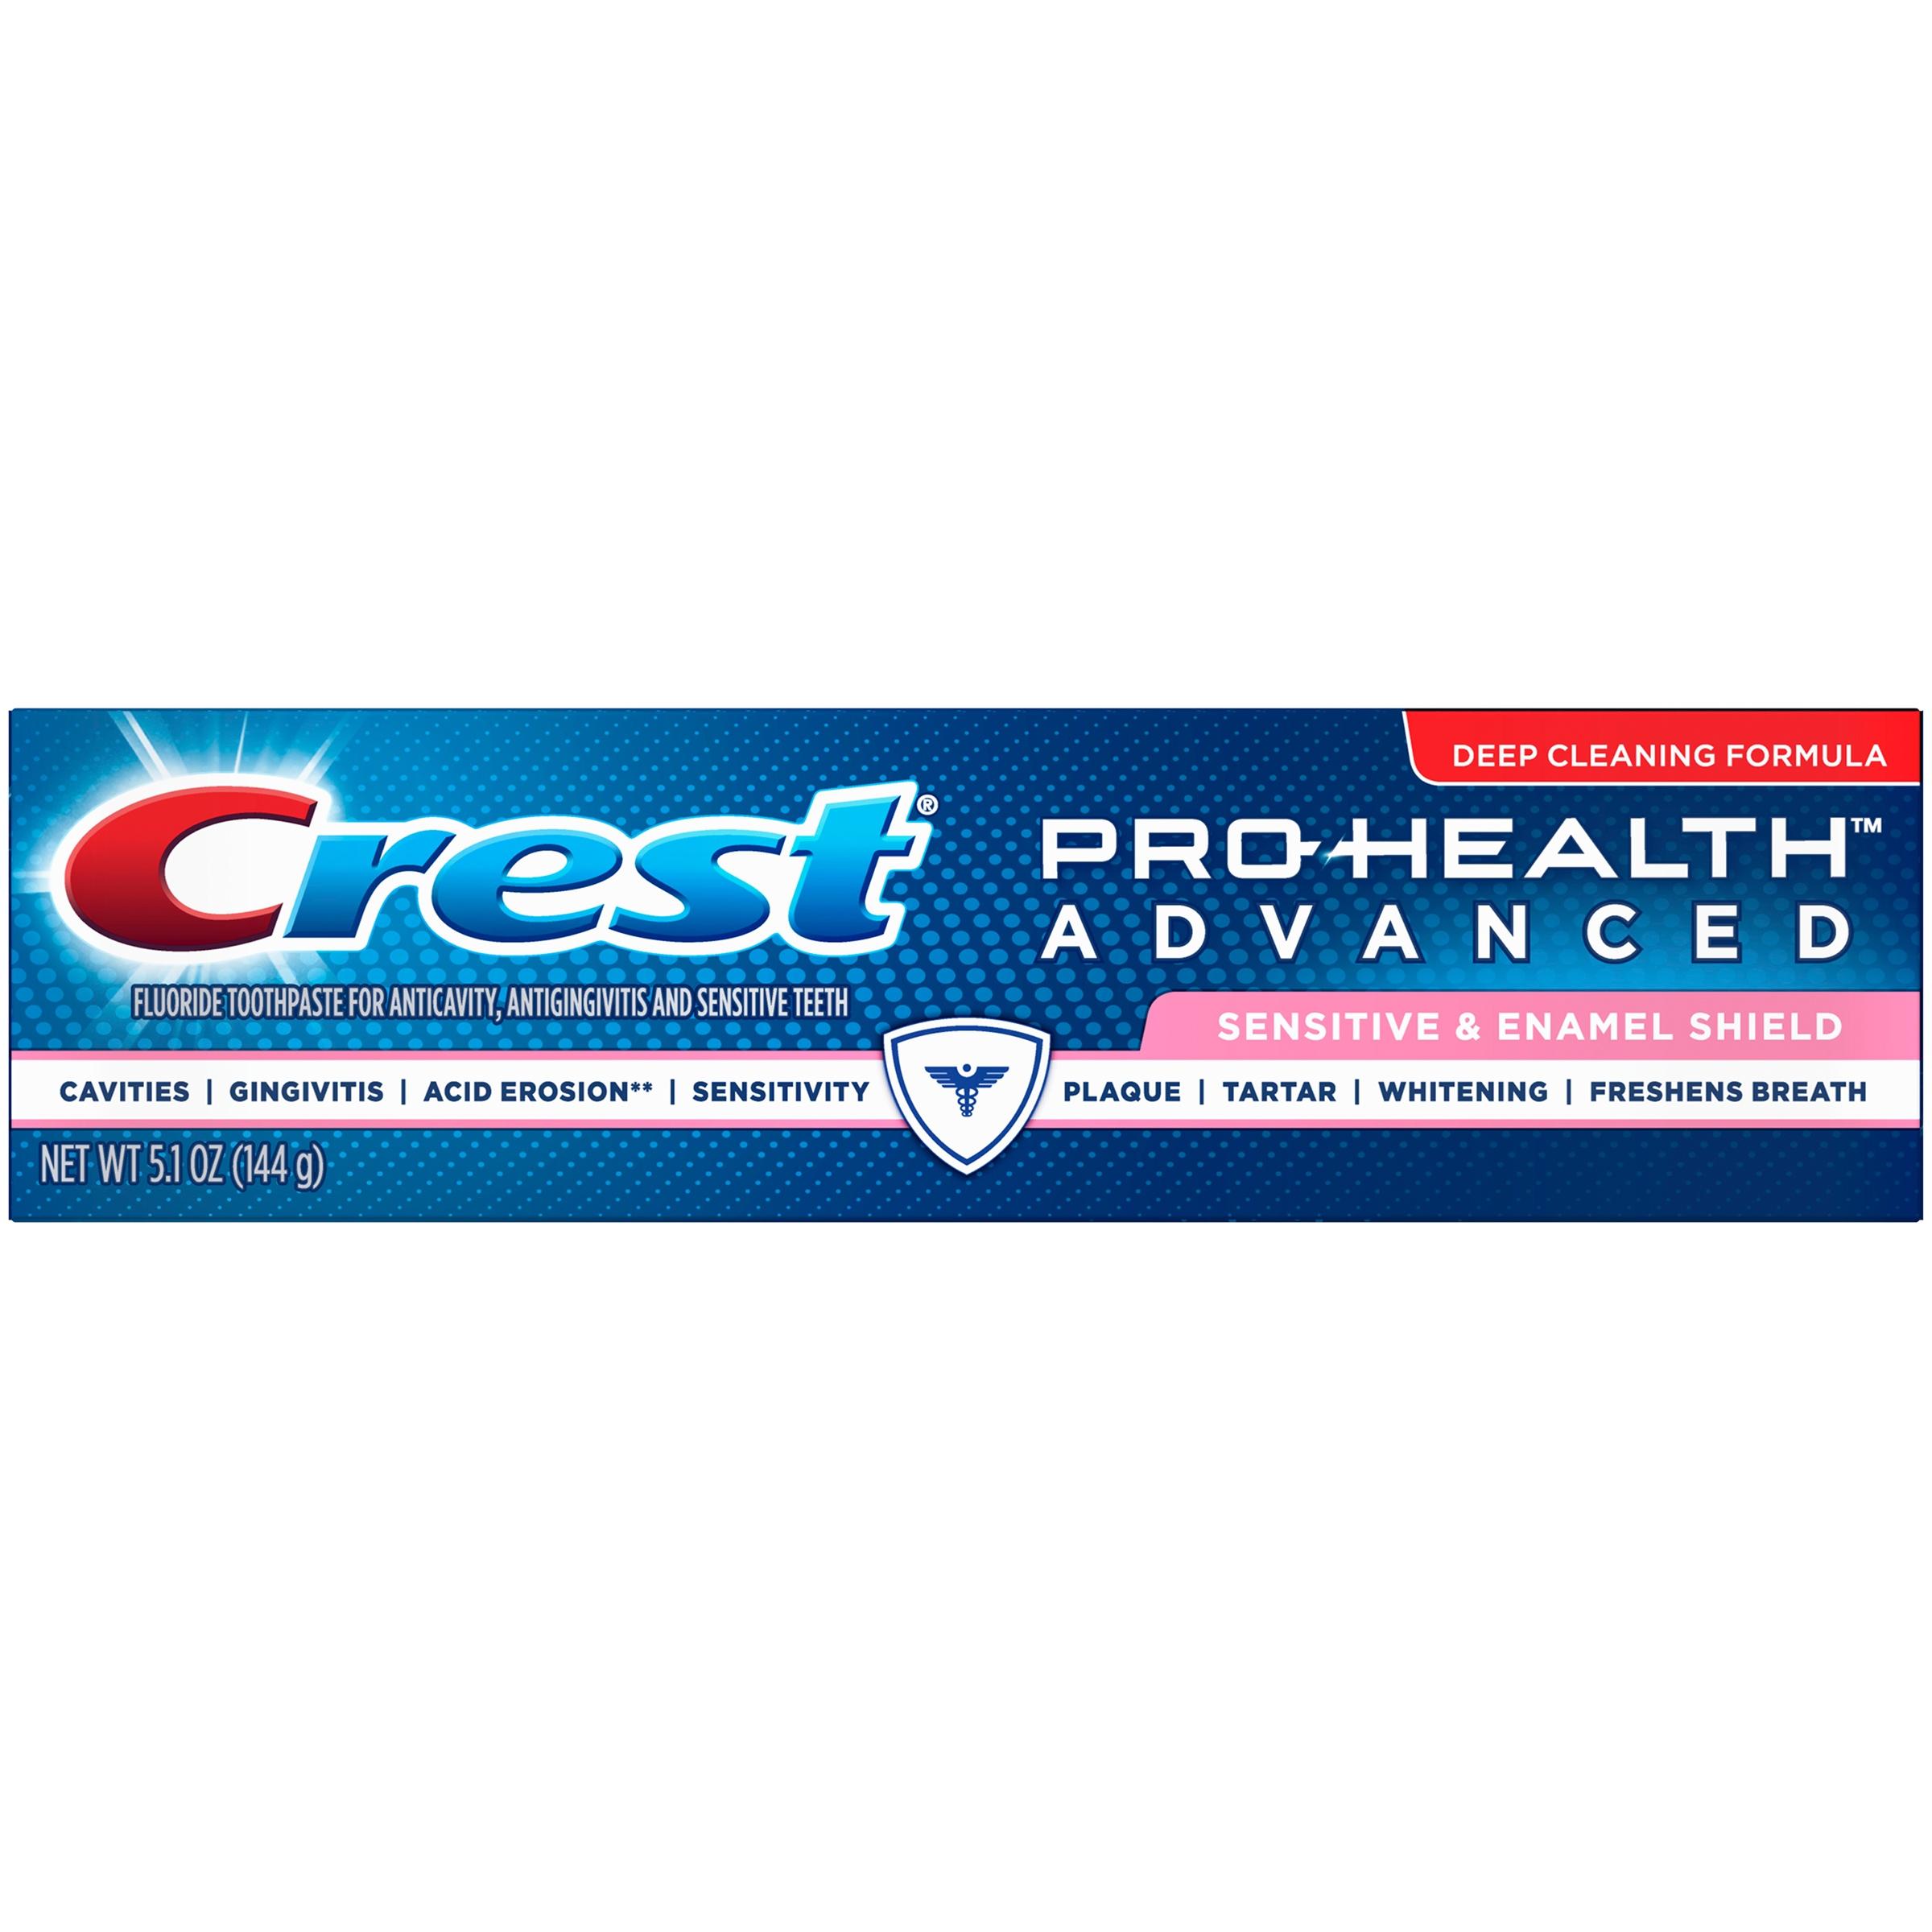 Crest Pro-Health Advanced Sensitive & Enamel Shield Toothpaste 5.1oz